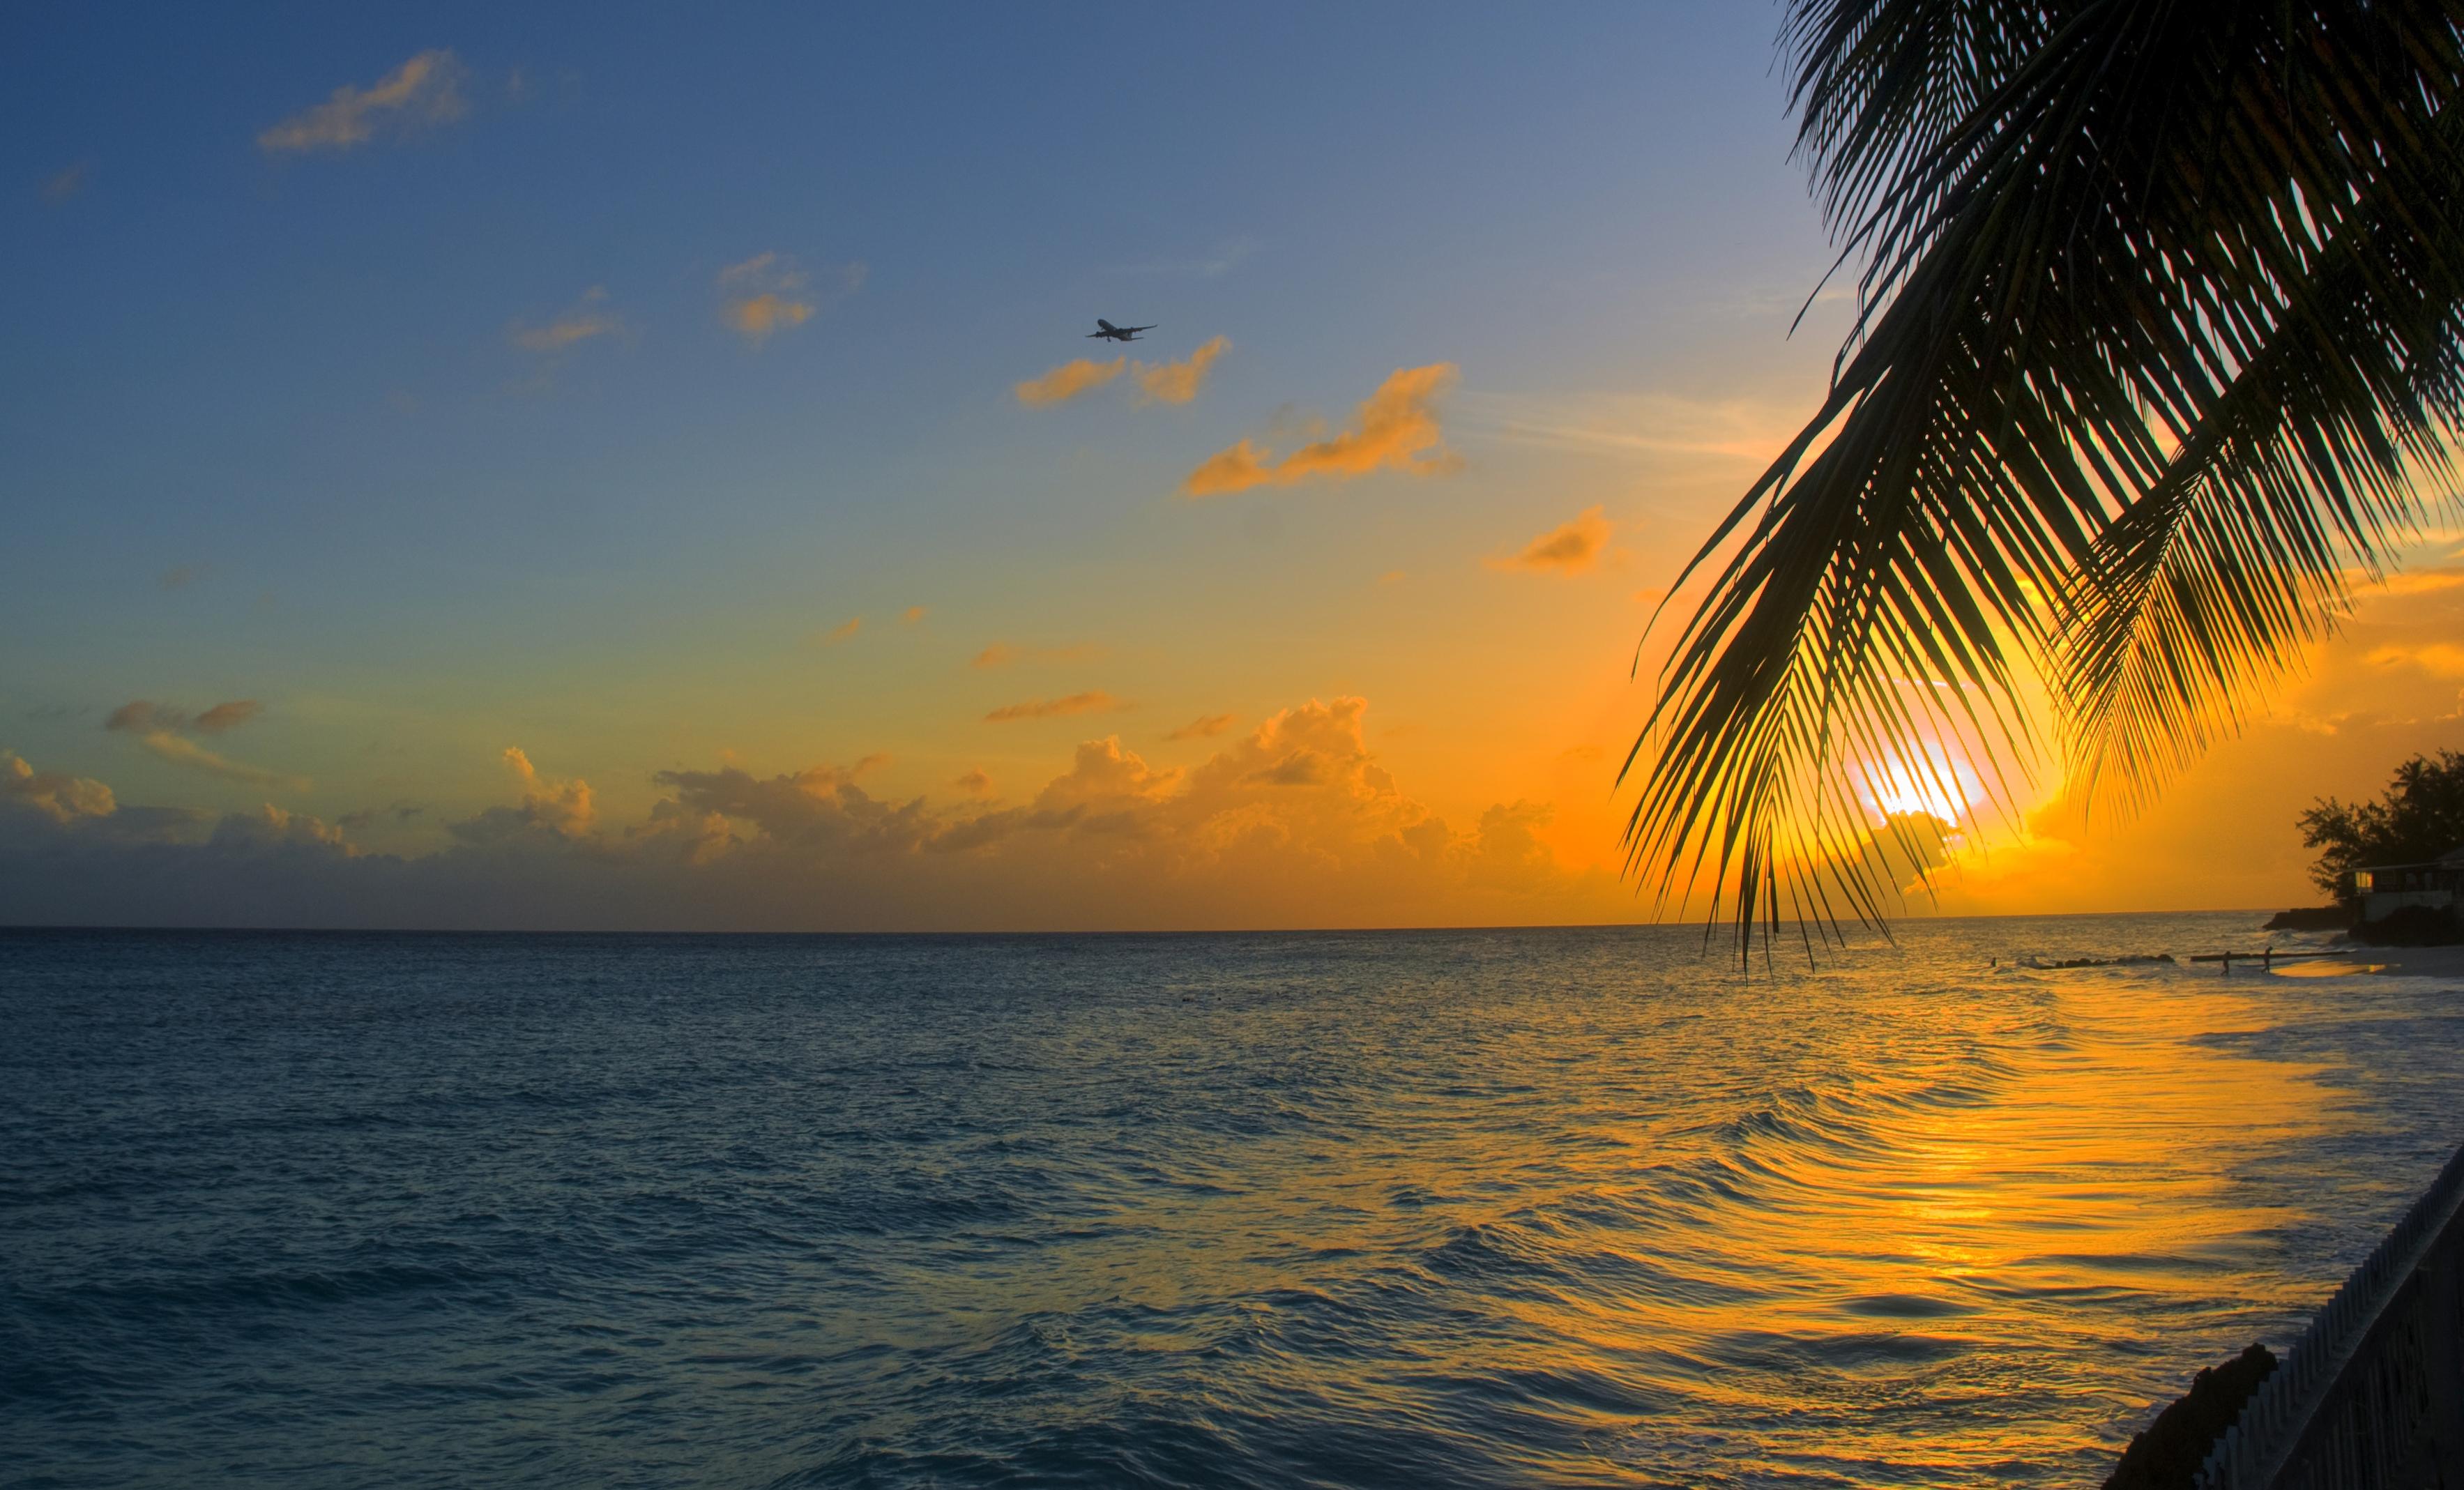 Sunset in Barbados - by Berit Watkin